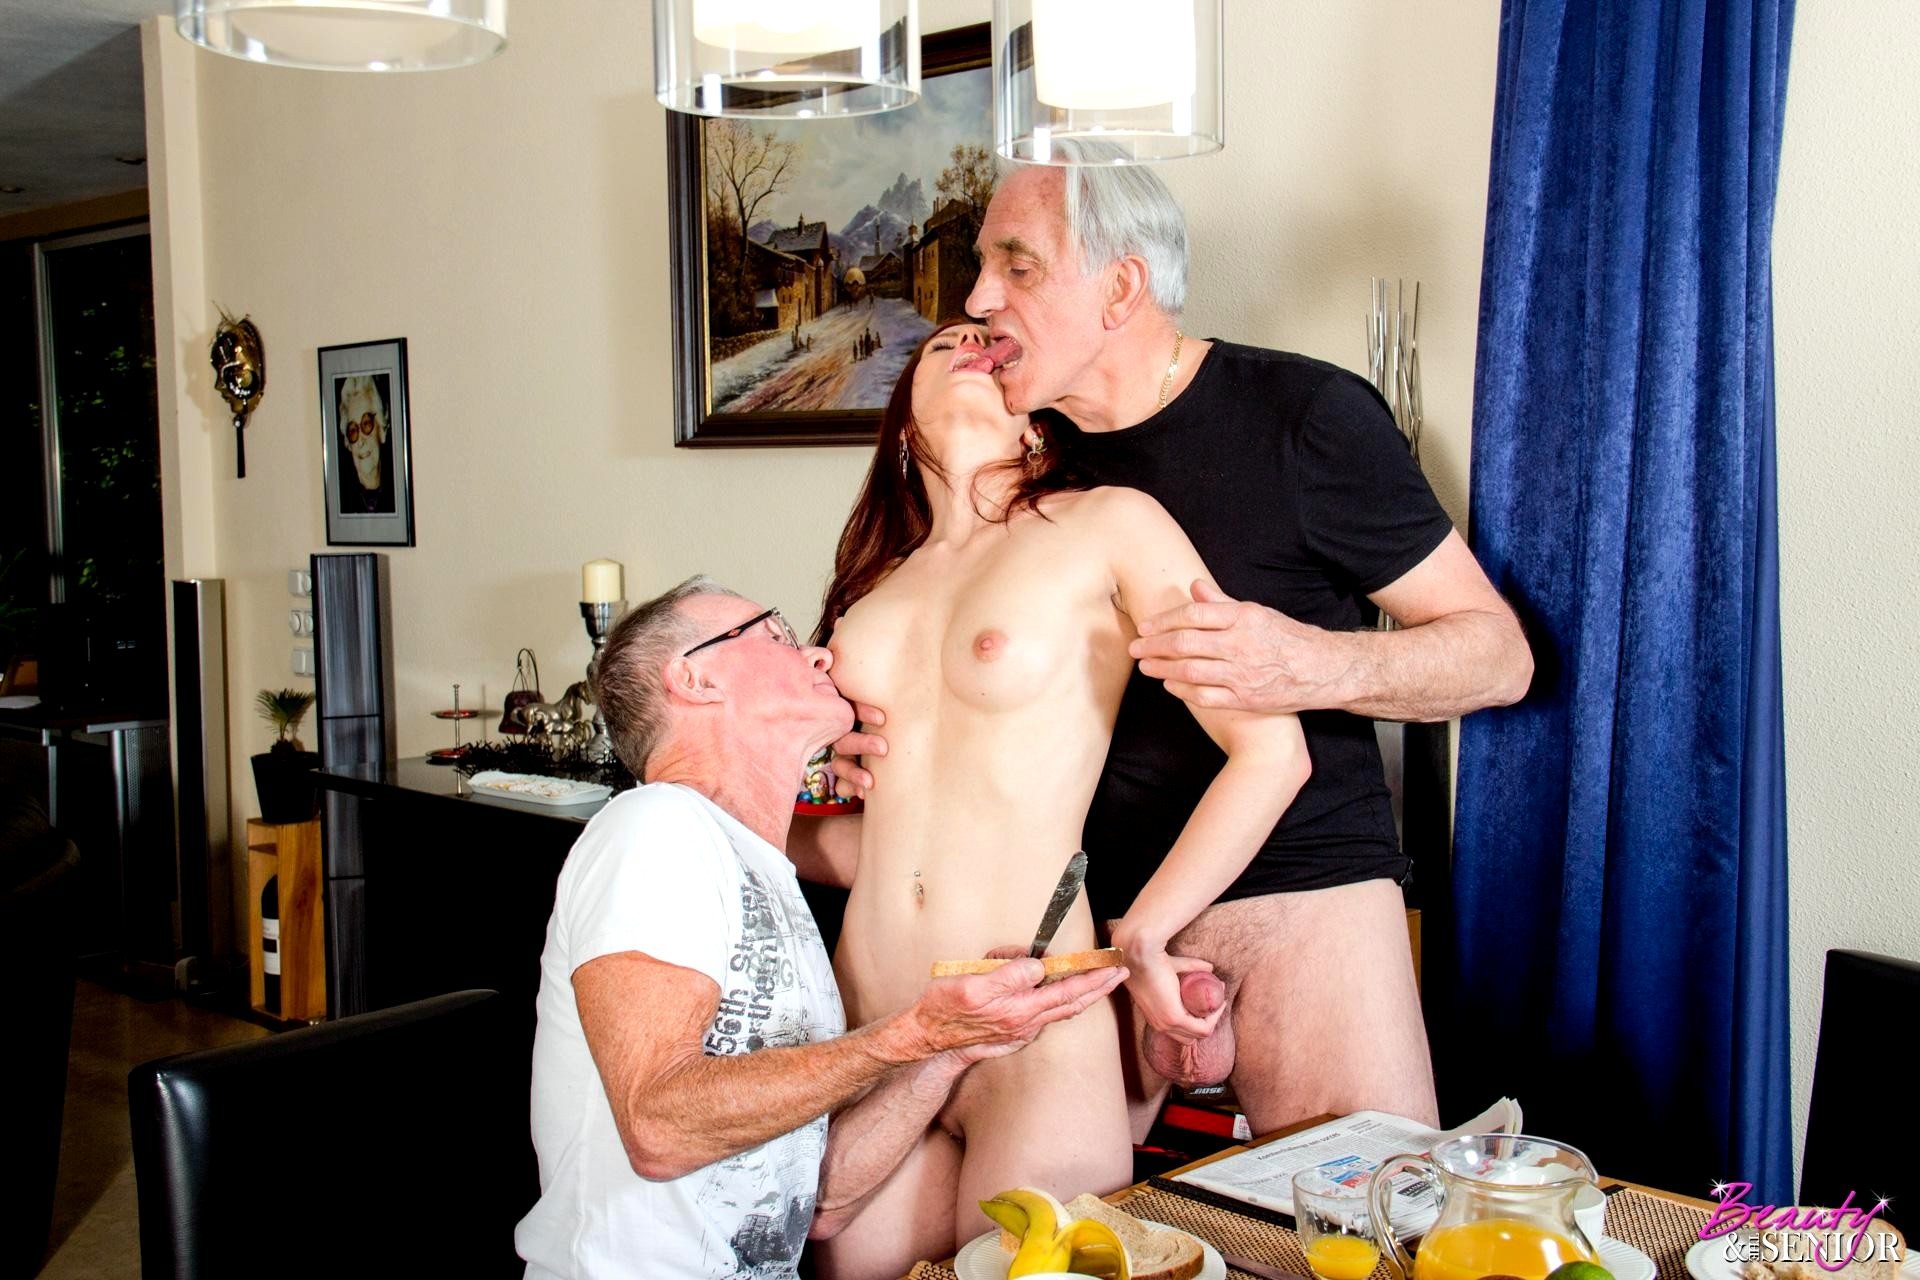 Senior citizens in threesome sex pictures